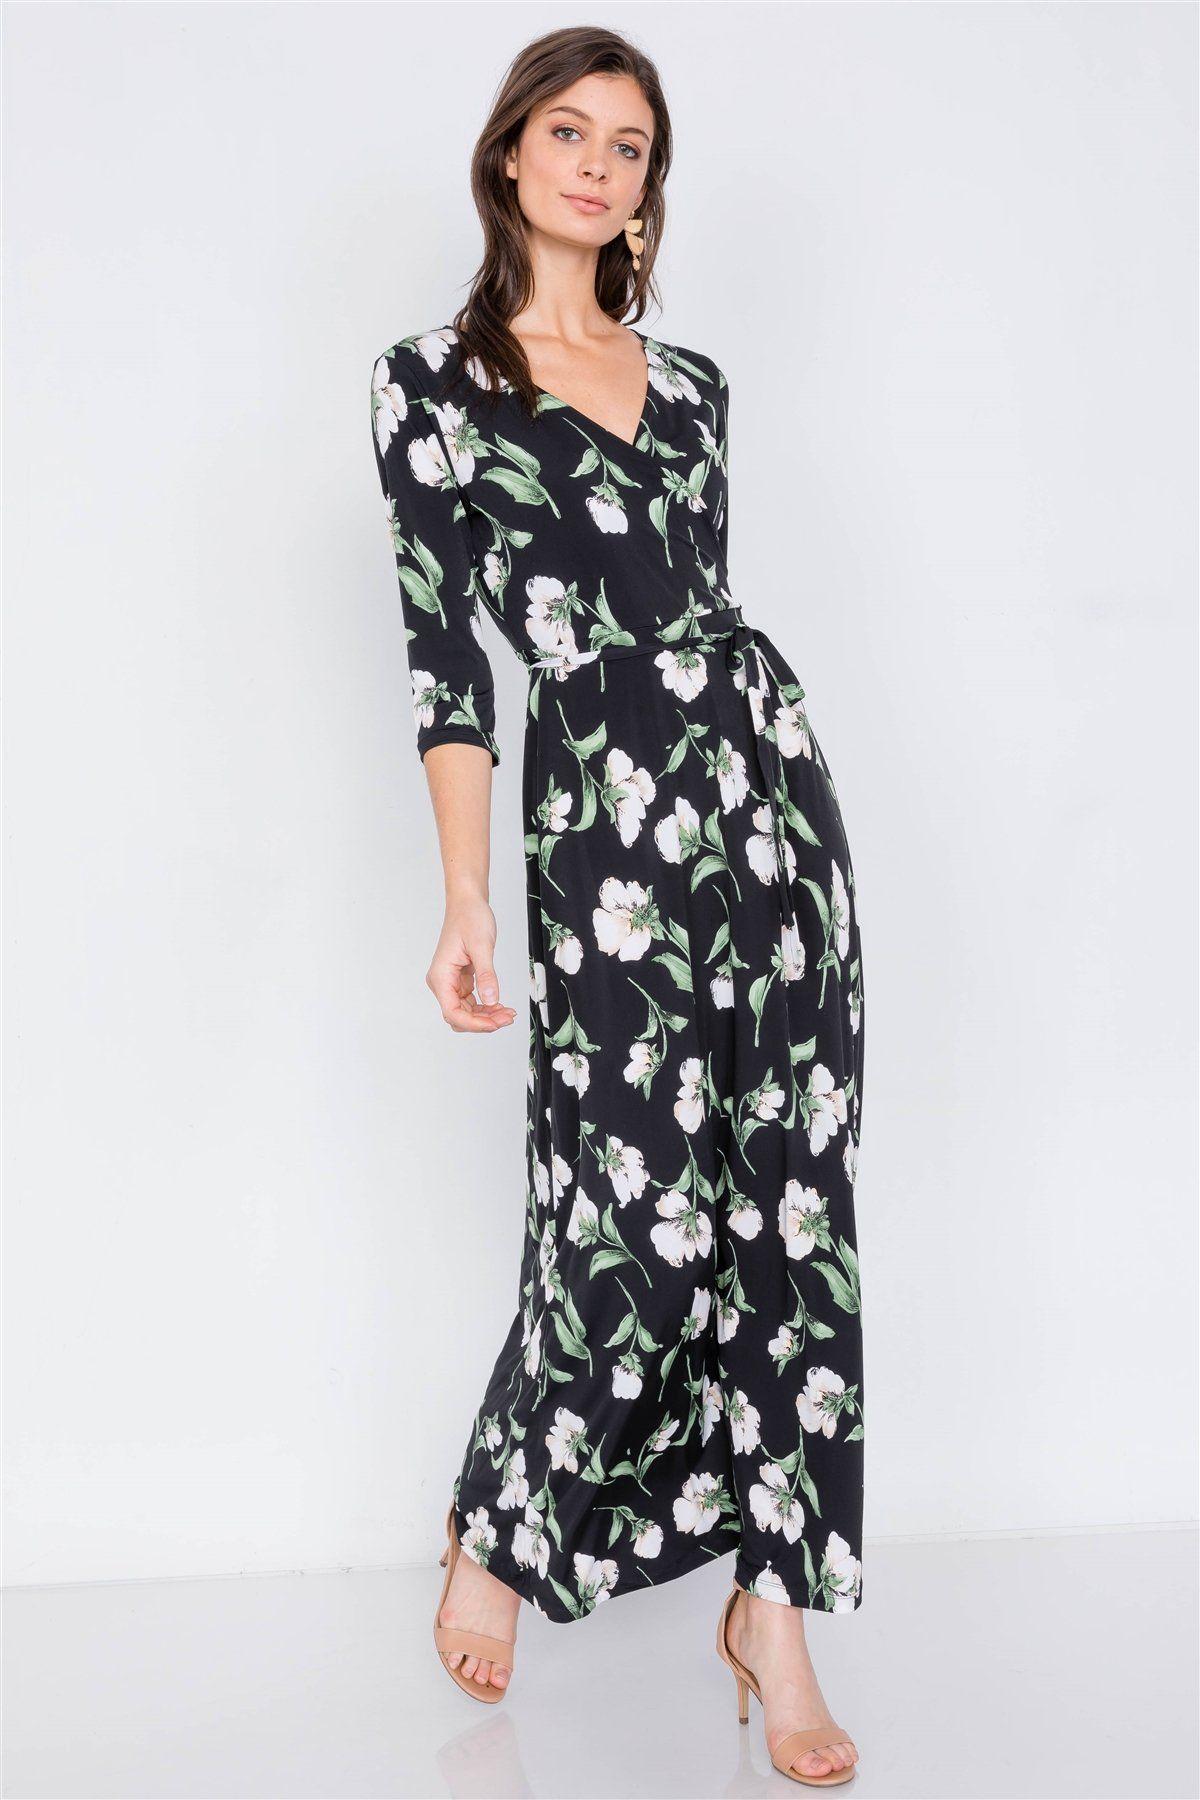 Black Floral Print Waist Tie 3 4 Sleeve Maxi Dress In 2021 Maxi Dress With Sleeves Black Floral Print Dress Elegant Maxi Dress [ 1800 x 1200 Pixel ]